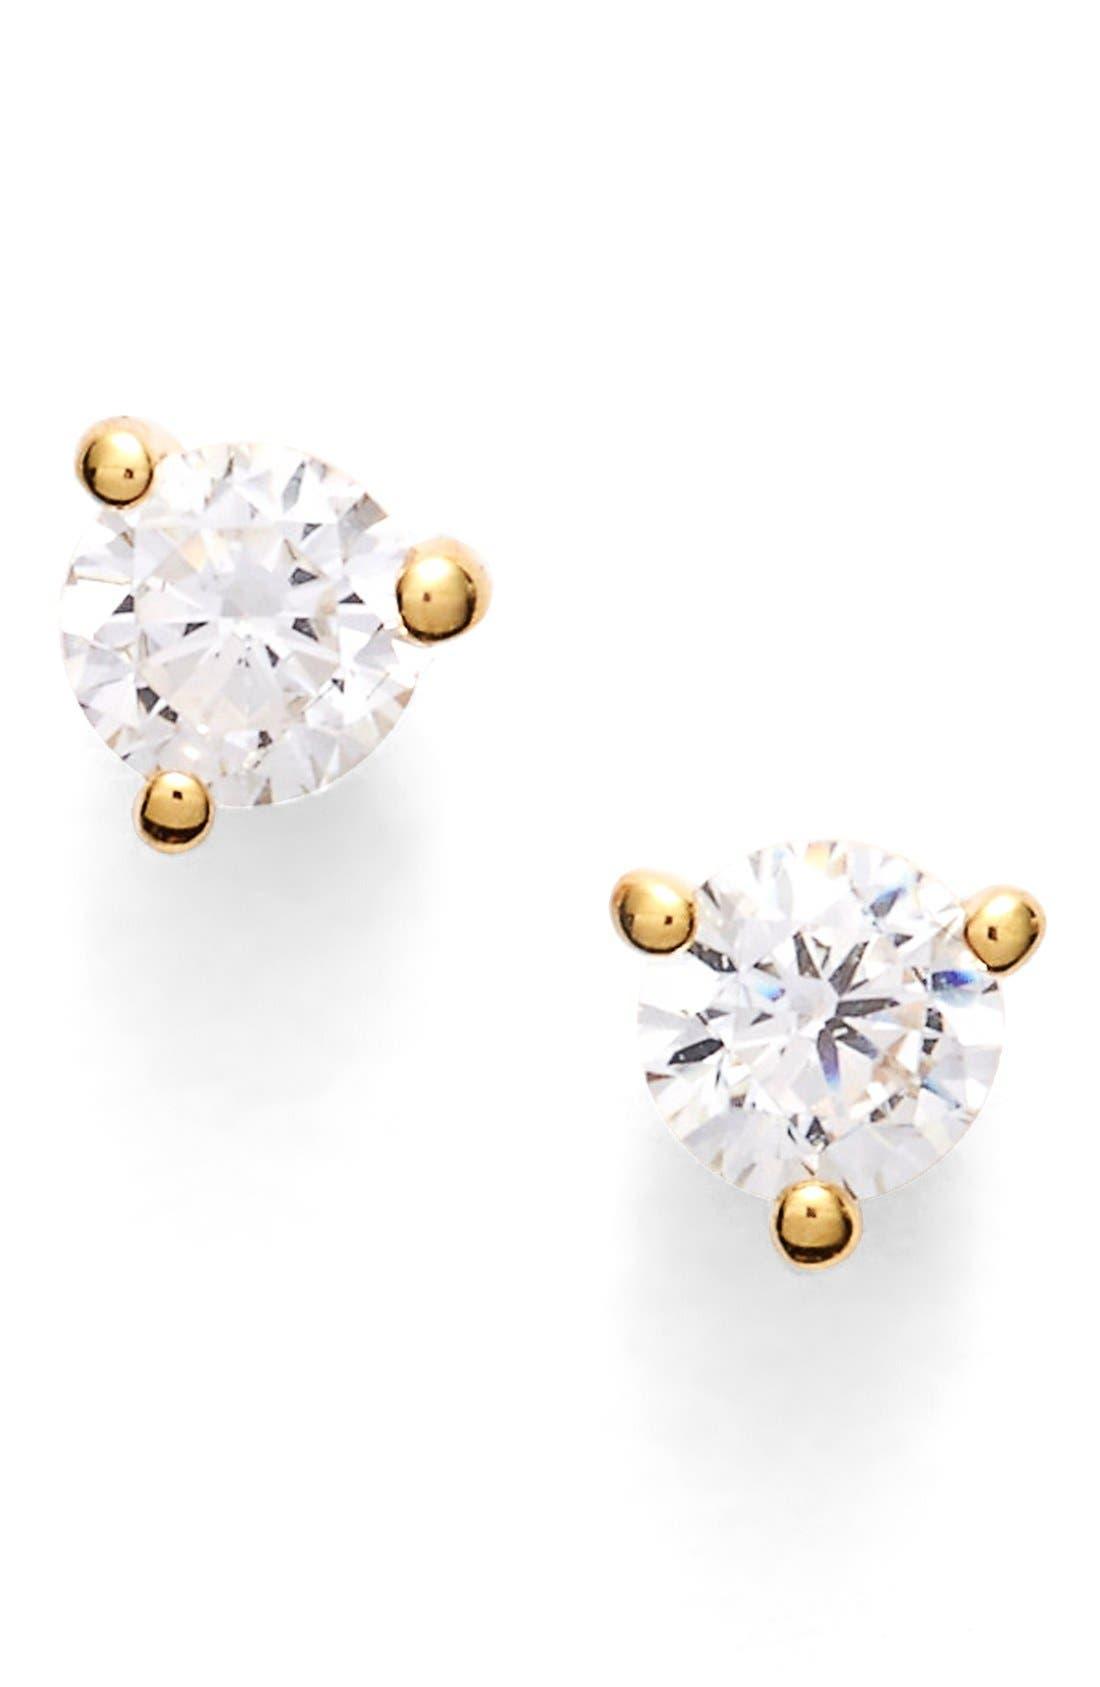 Nordstrom Precious Metal Plated 0.25ct tw Cubic Zirconia Stud Earrings